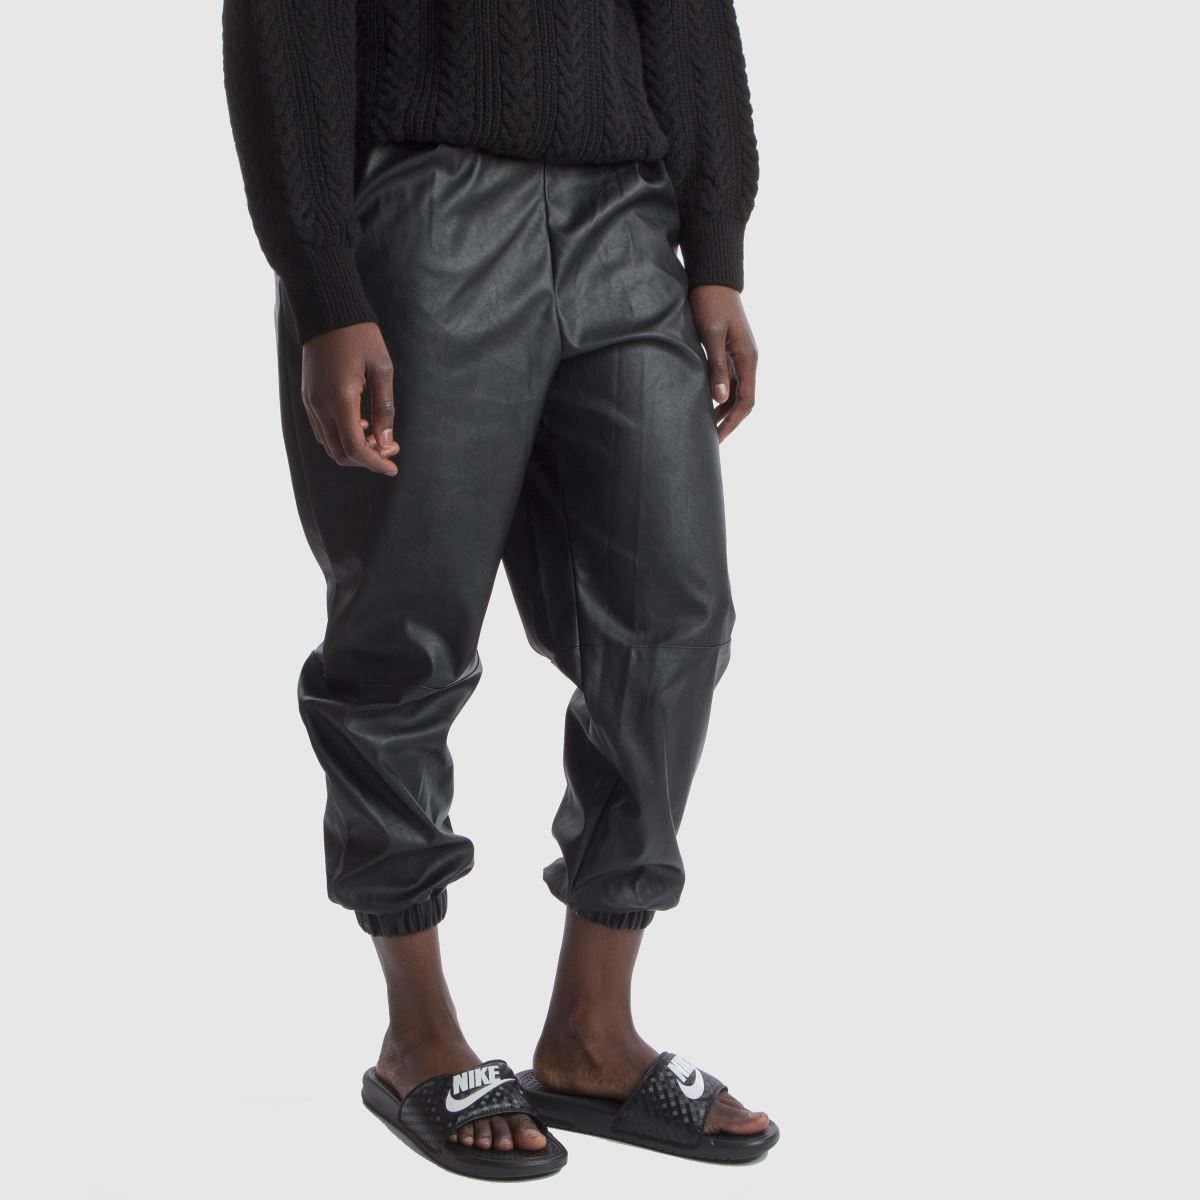 Damen Schwarz-weiß nike Benassi Slide Qualität Sandalen | schuh Gute Qualität Slide beliebte Schuhe 9e5cdb